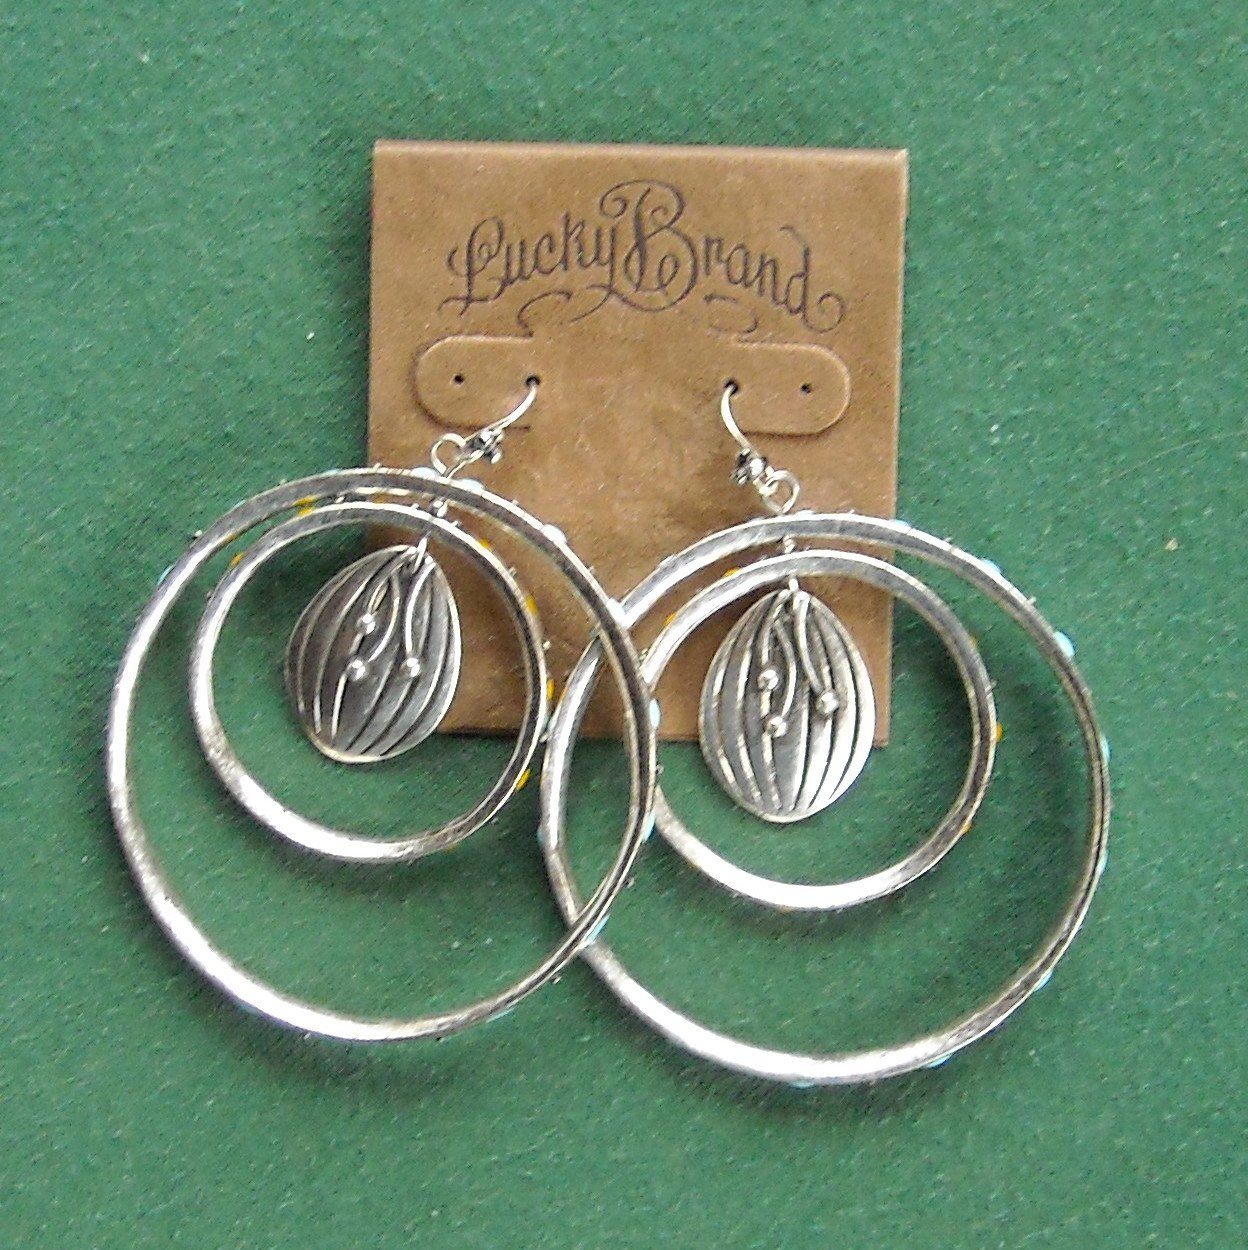 Lucky Brand Silver Tone Double Hoop Earrings NWT